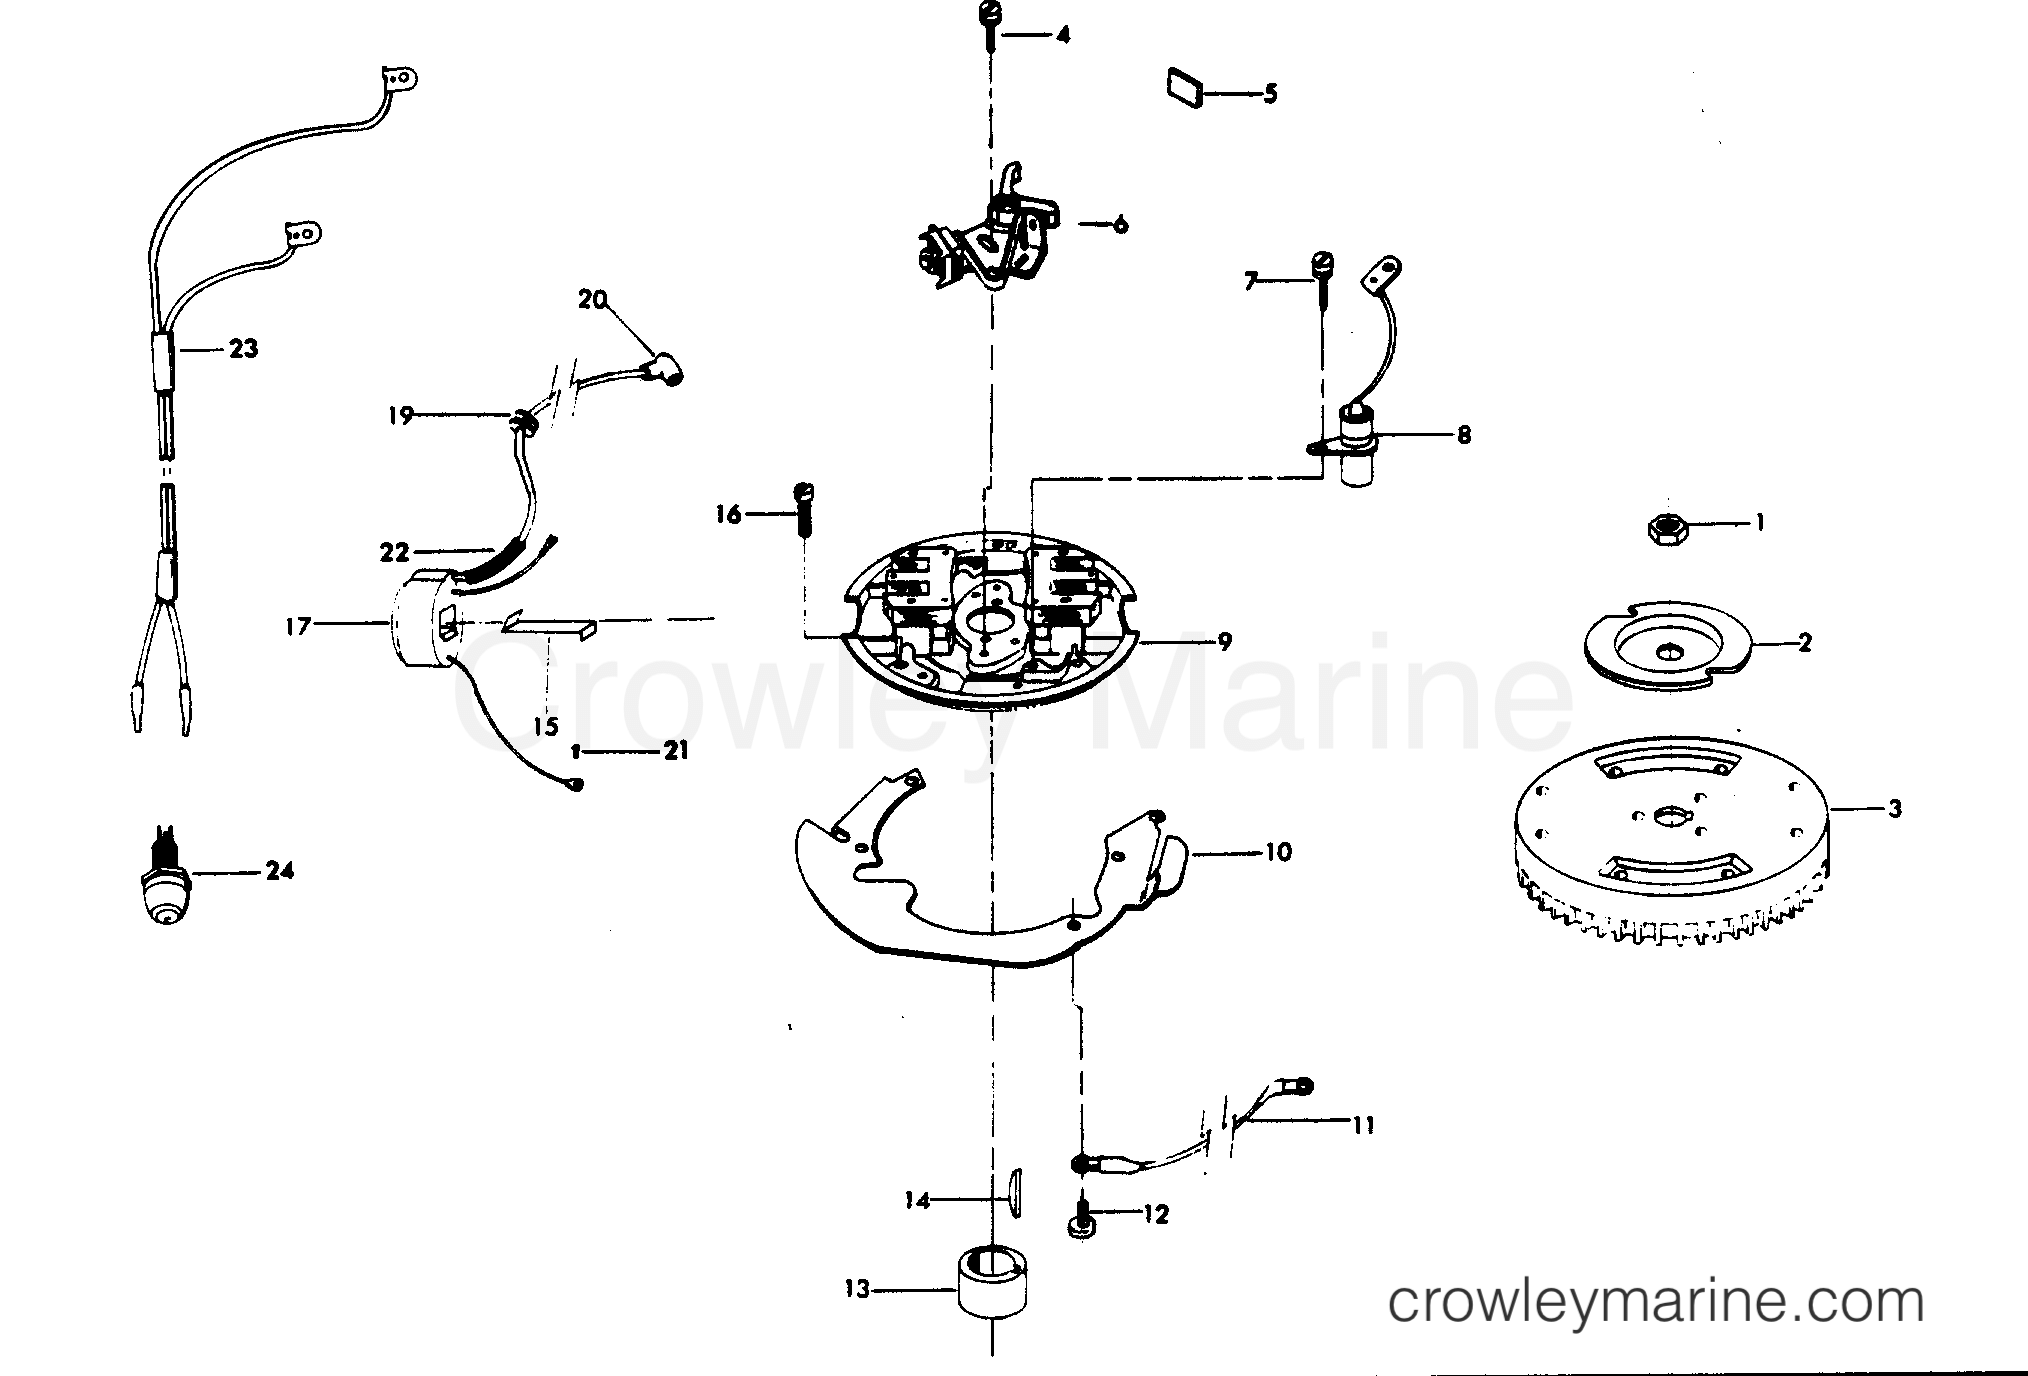 Magneto Manual Start Models